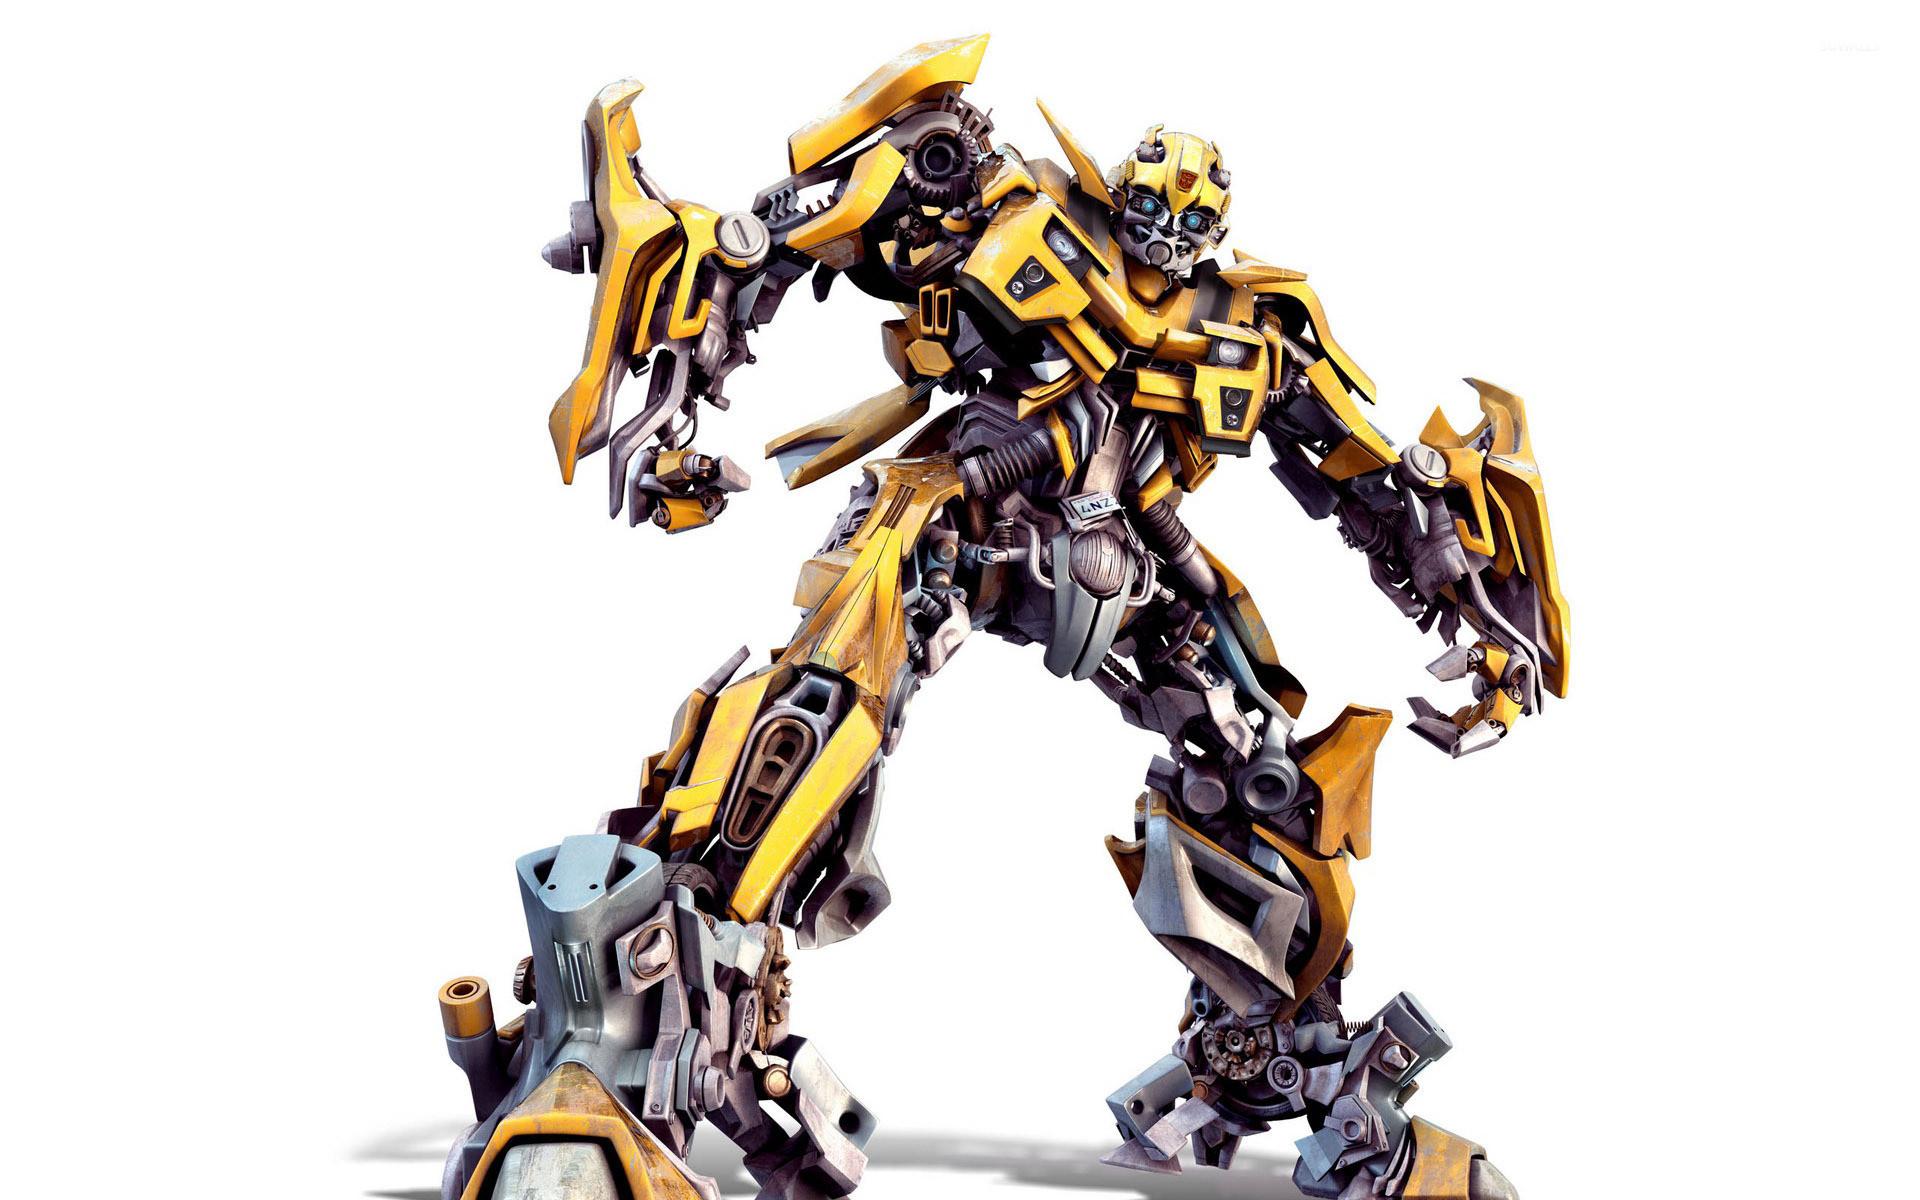 Transformers 2 Bumblebee Wallpaper (61+ images)